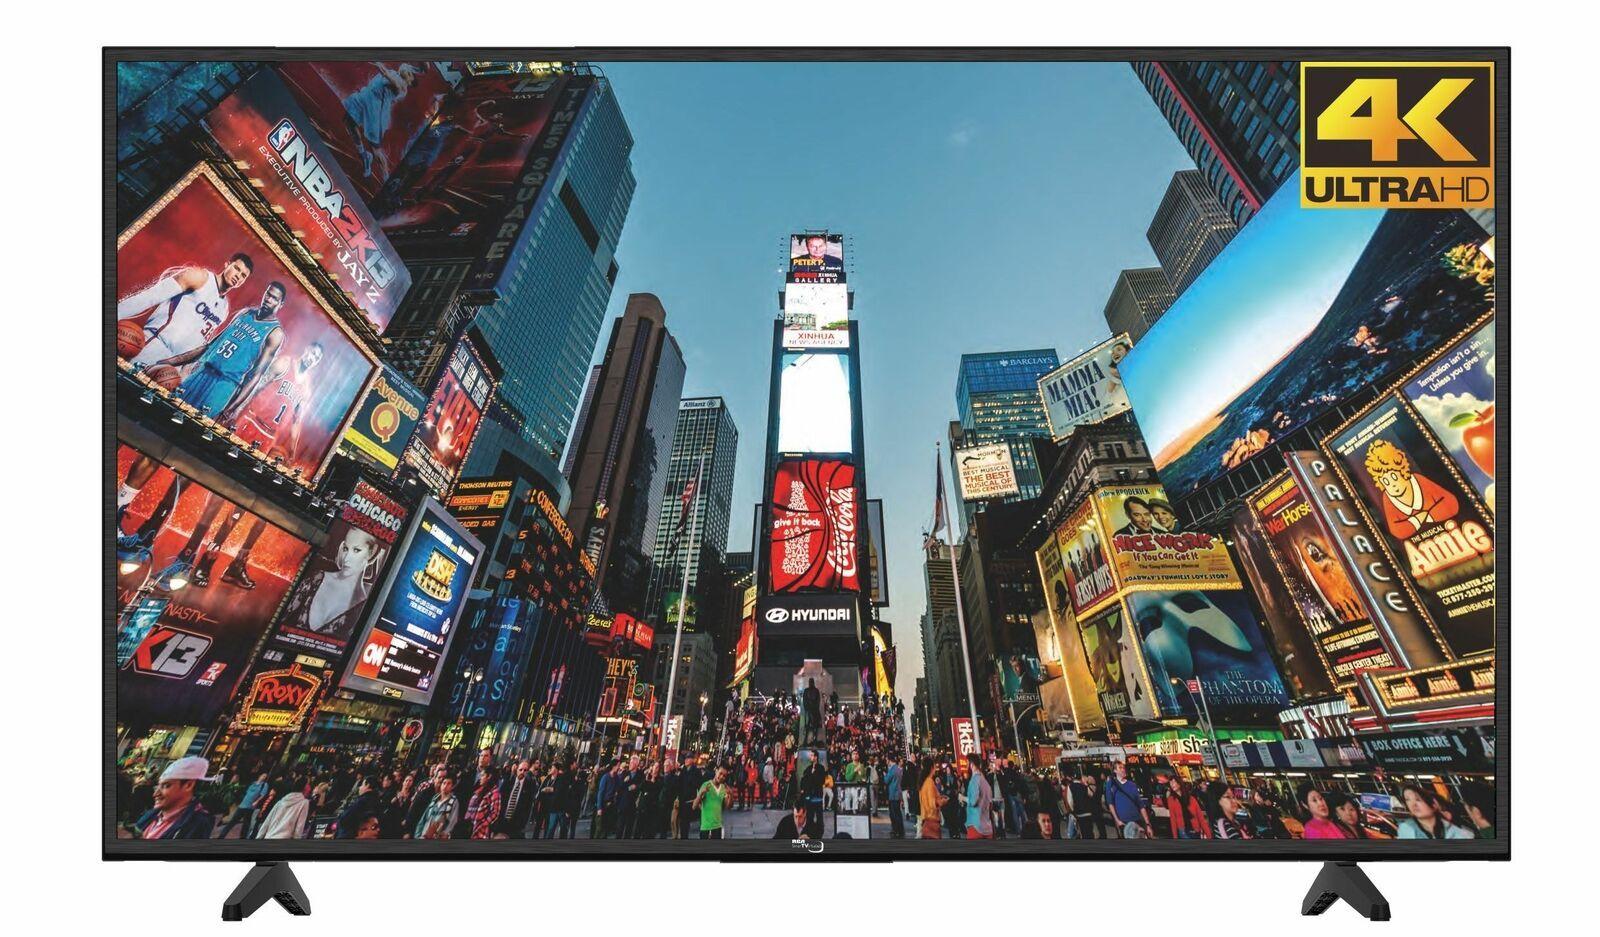 "RCA VIRTUOSO 55"" Class 4K Ultra HD (2160P) Smart LED TV (RNSMU5536)"